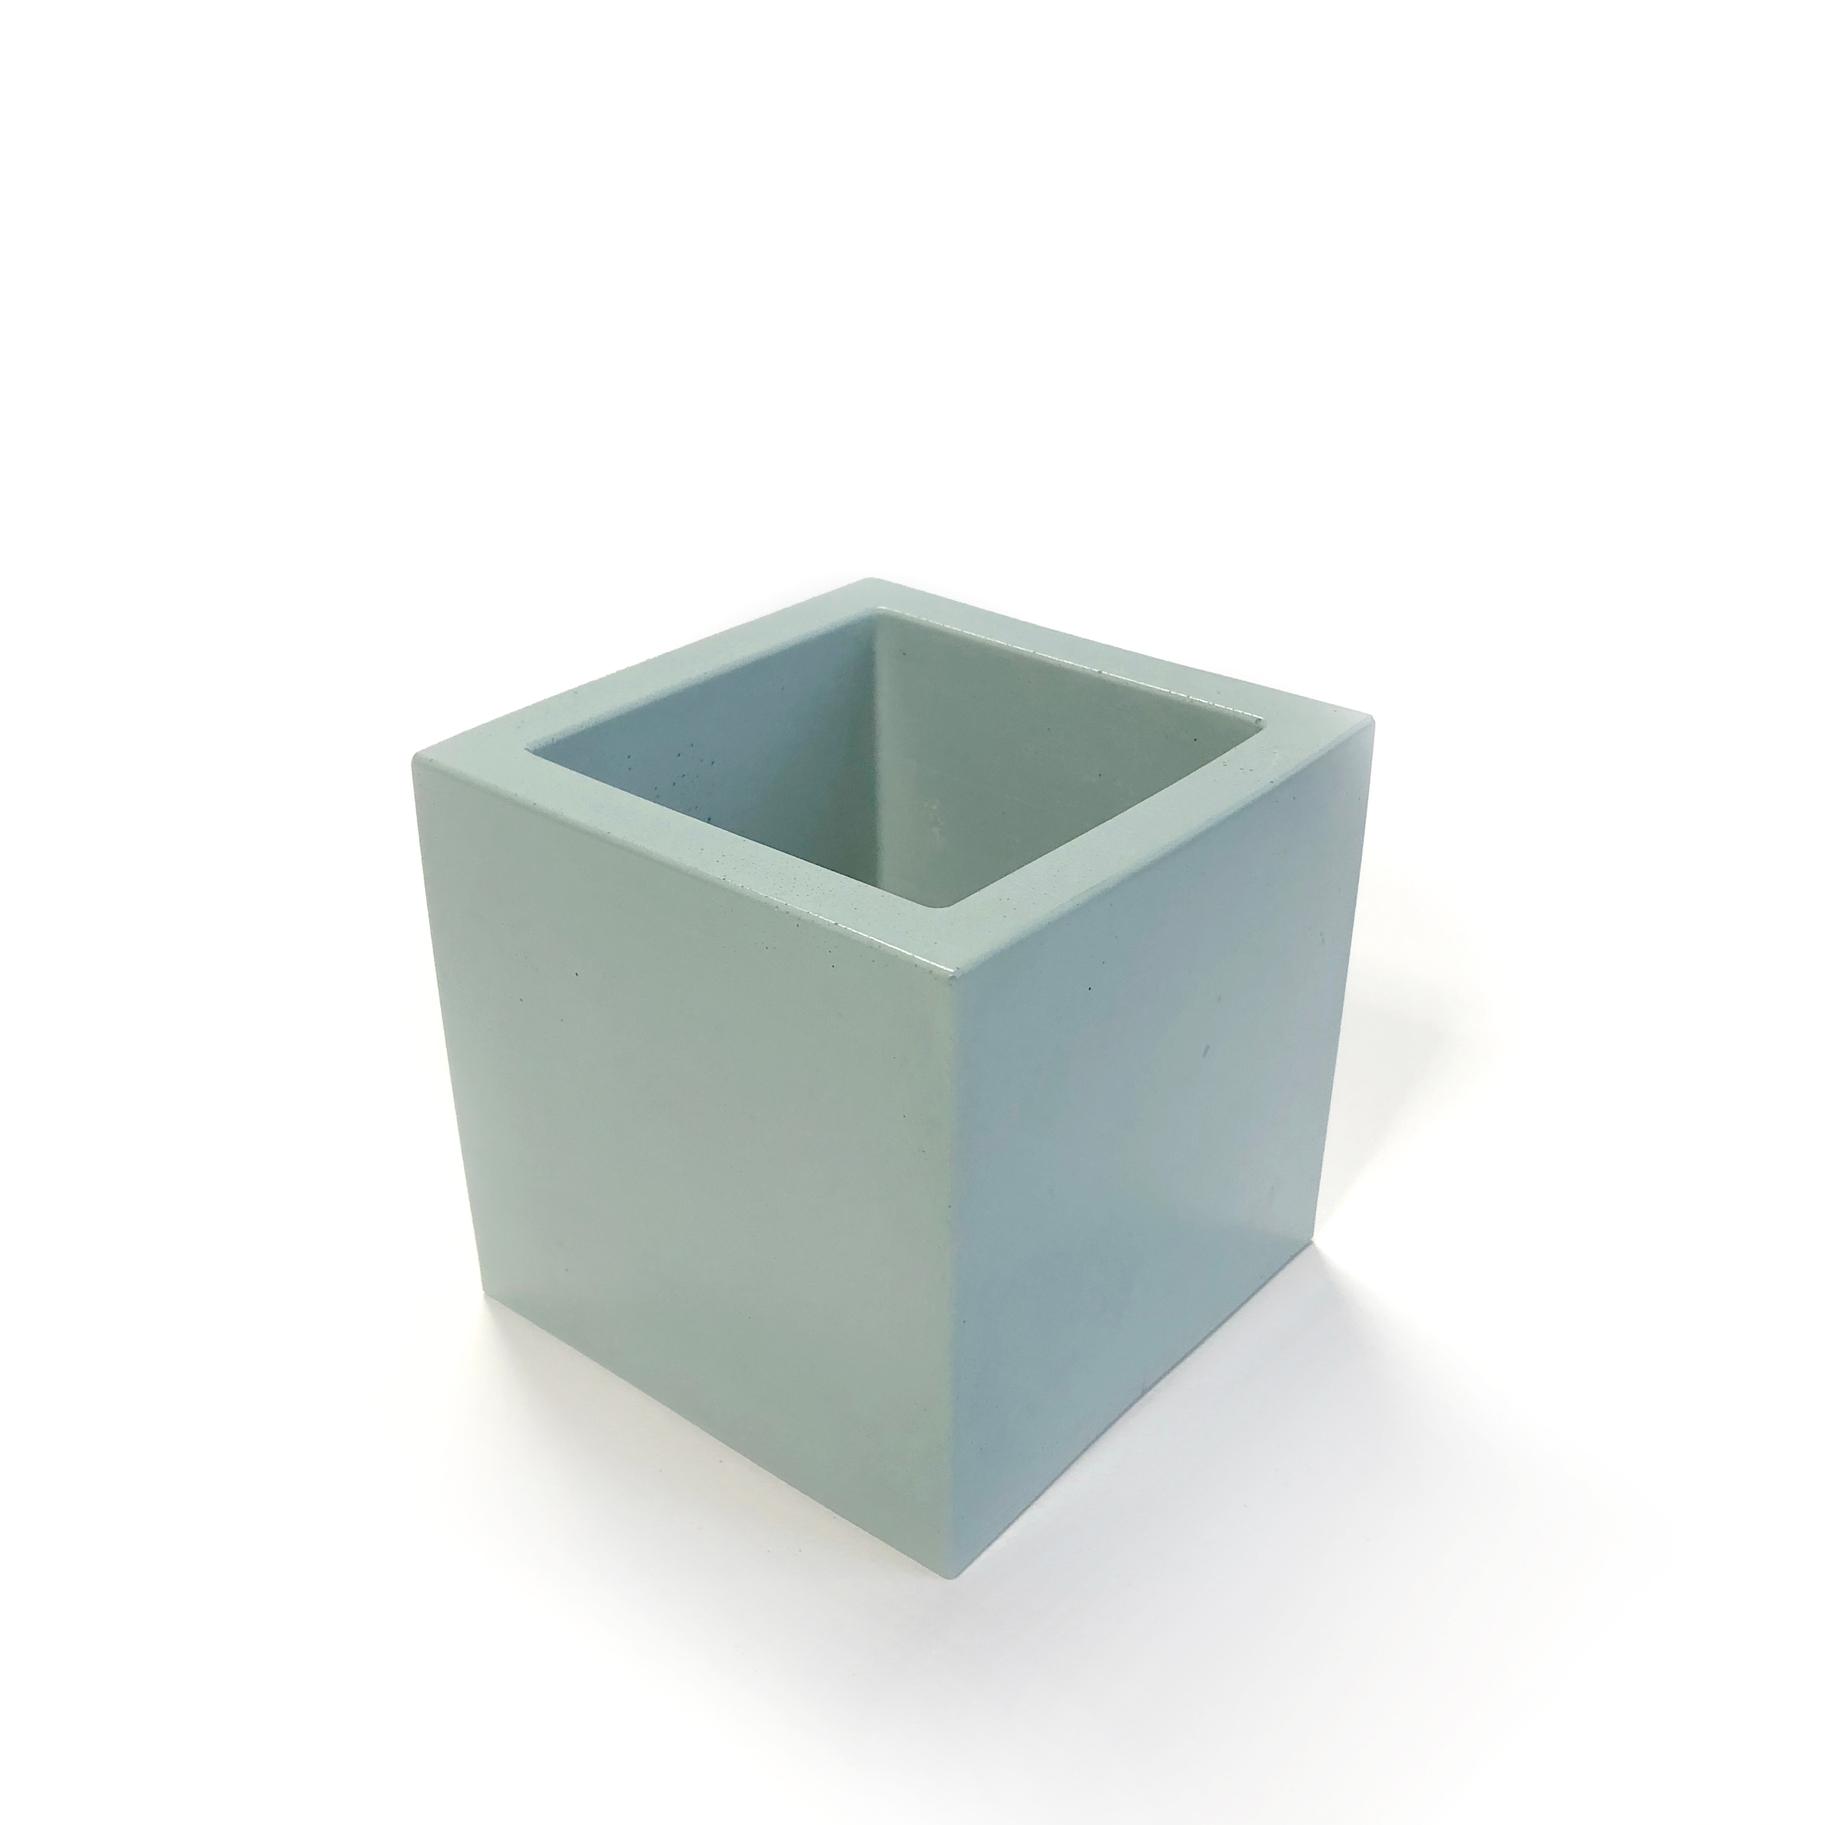 Mint Medium Square Concrete Planter